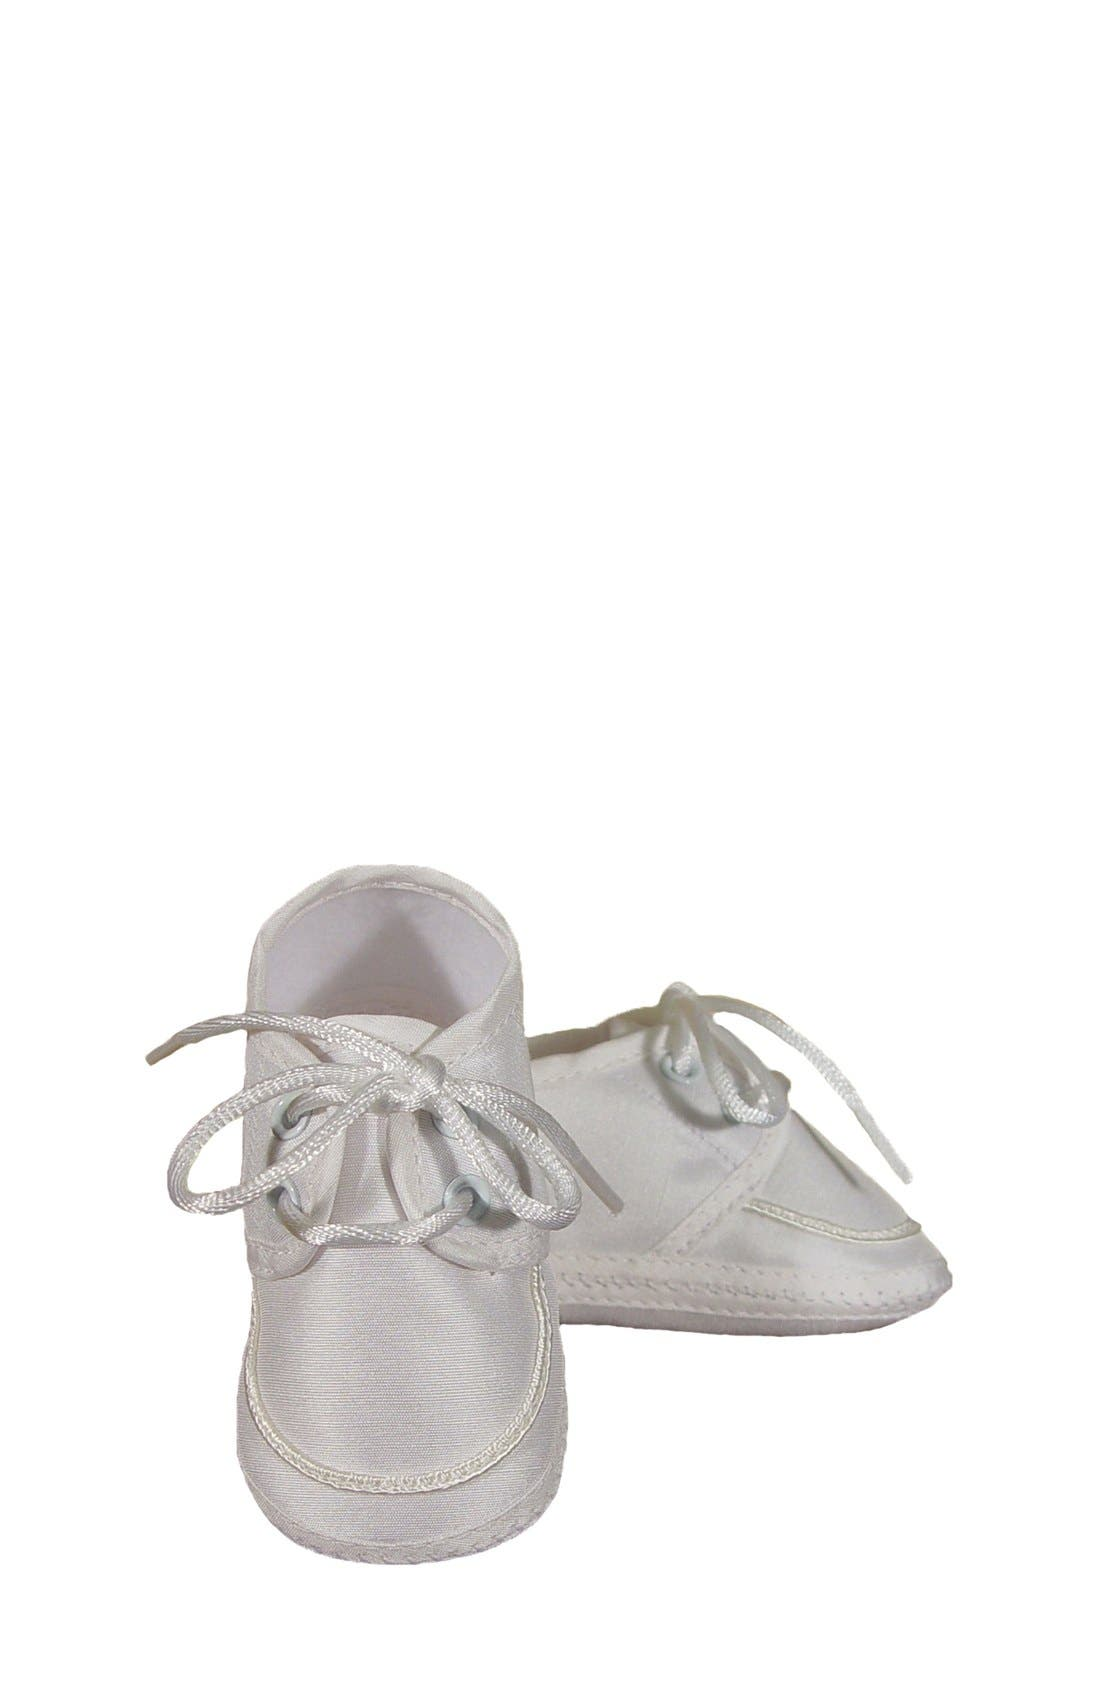 Silk Shoe,                             Main thumbnail 1, color,                             White